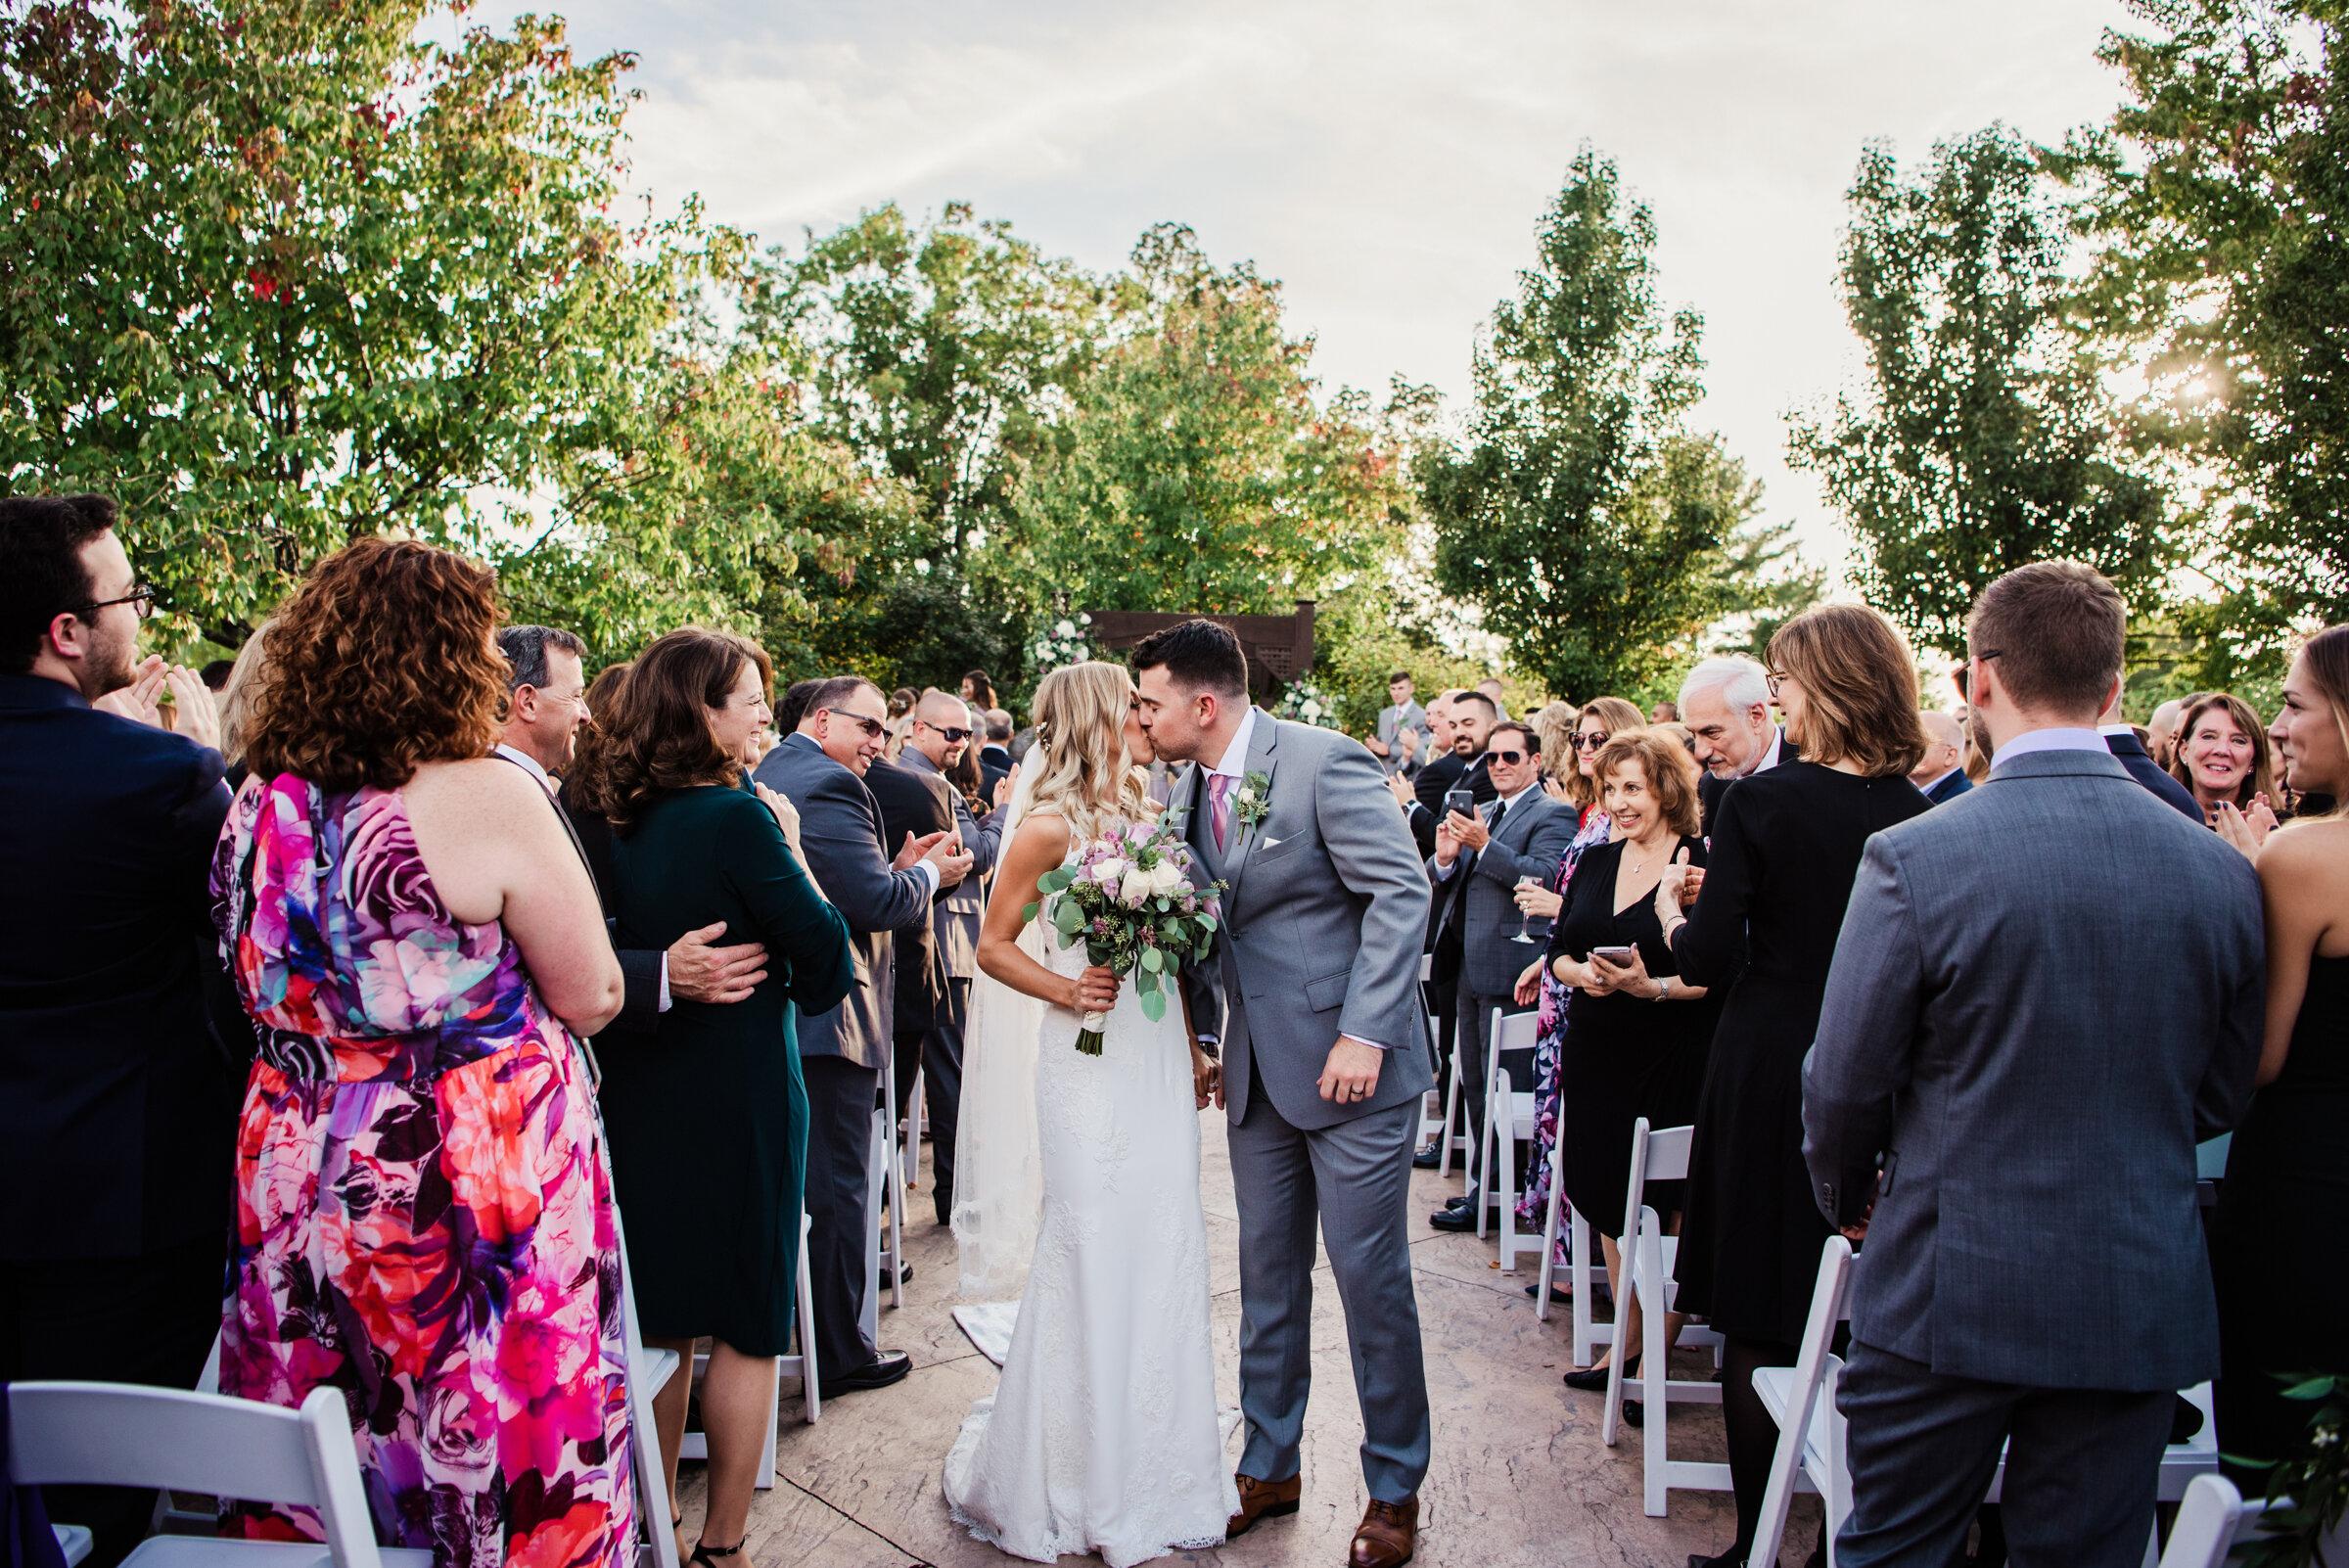 Deerfield_Country_Club_Rochester_Wedding_JILL_STUDIO_Rochester_NY_Photographer_DSC_6825.jpg